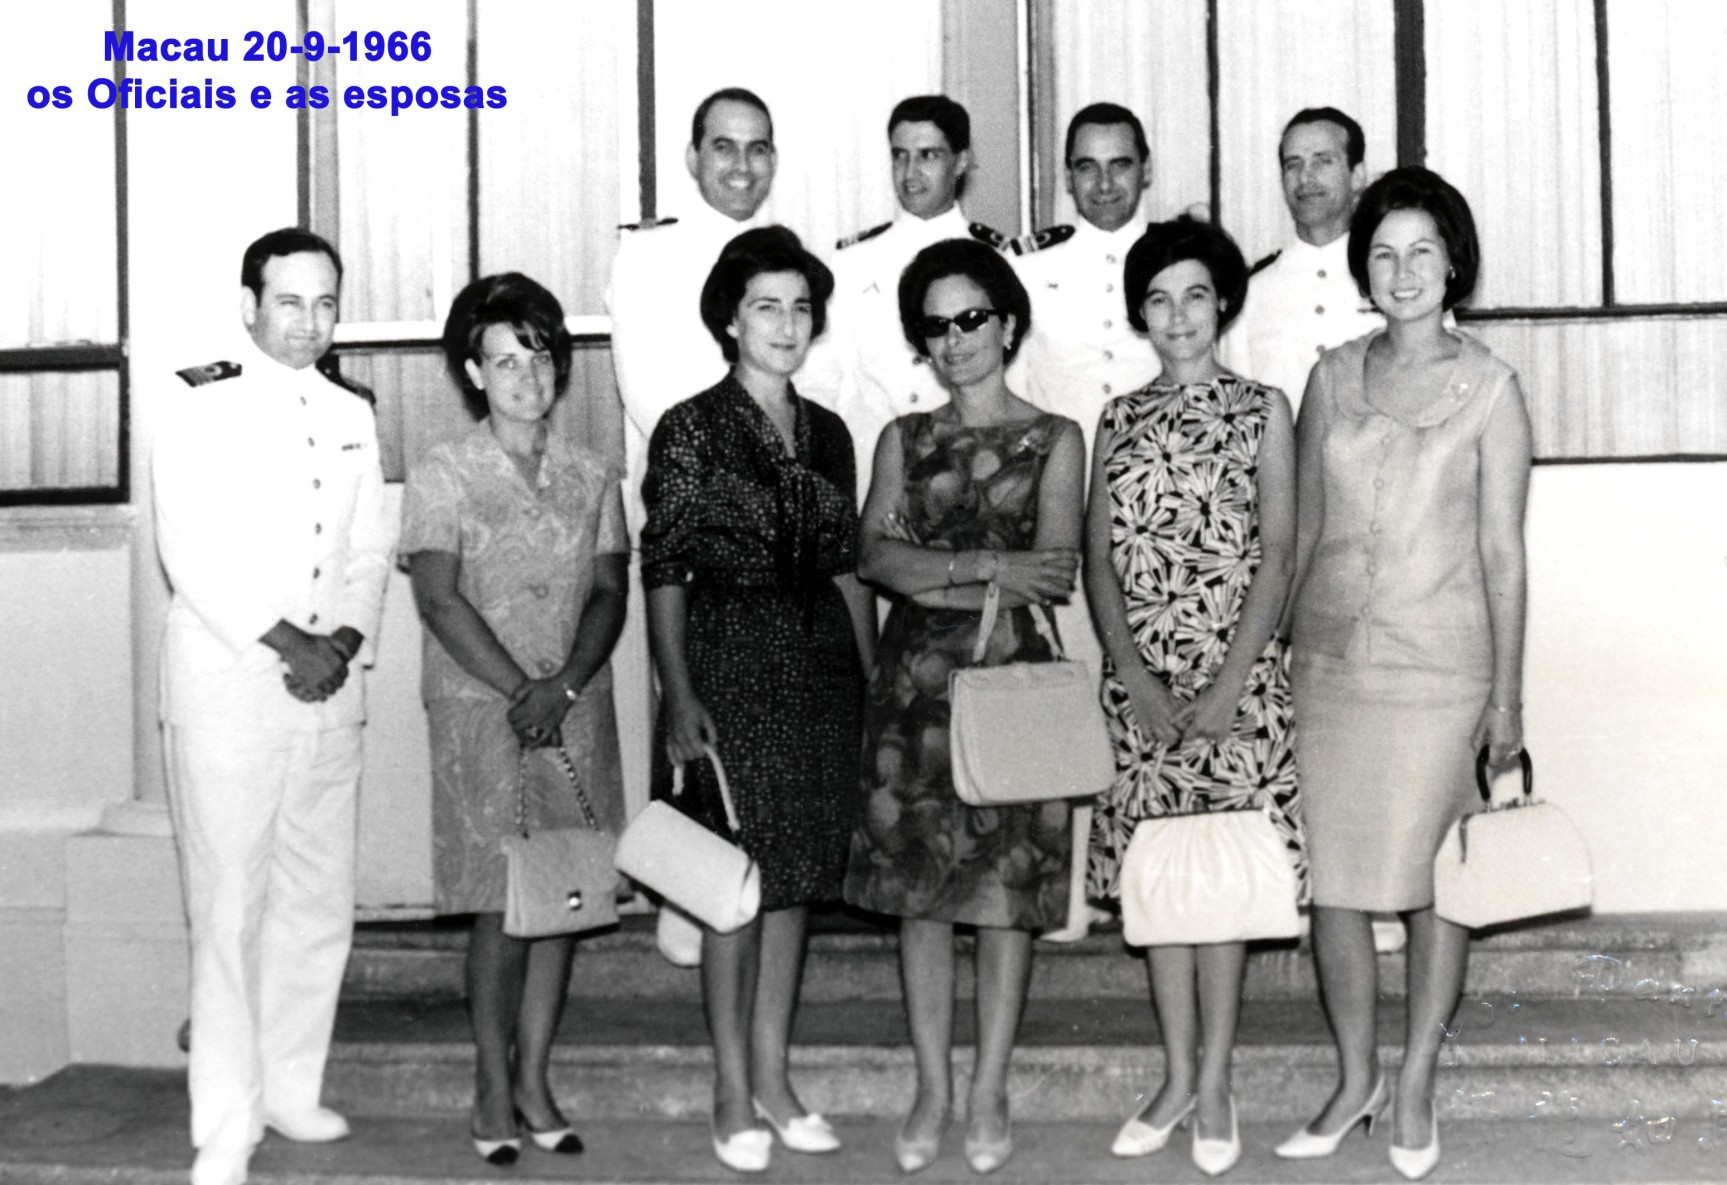 022 66-09-20 o grupo dos oficiais e esposas